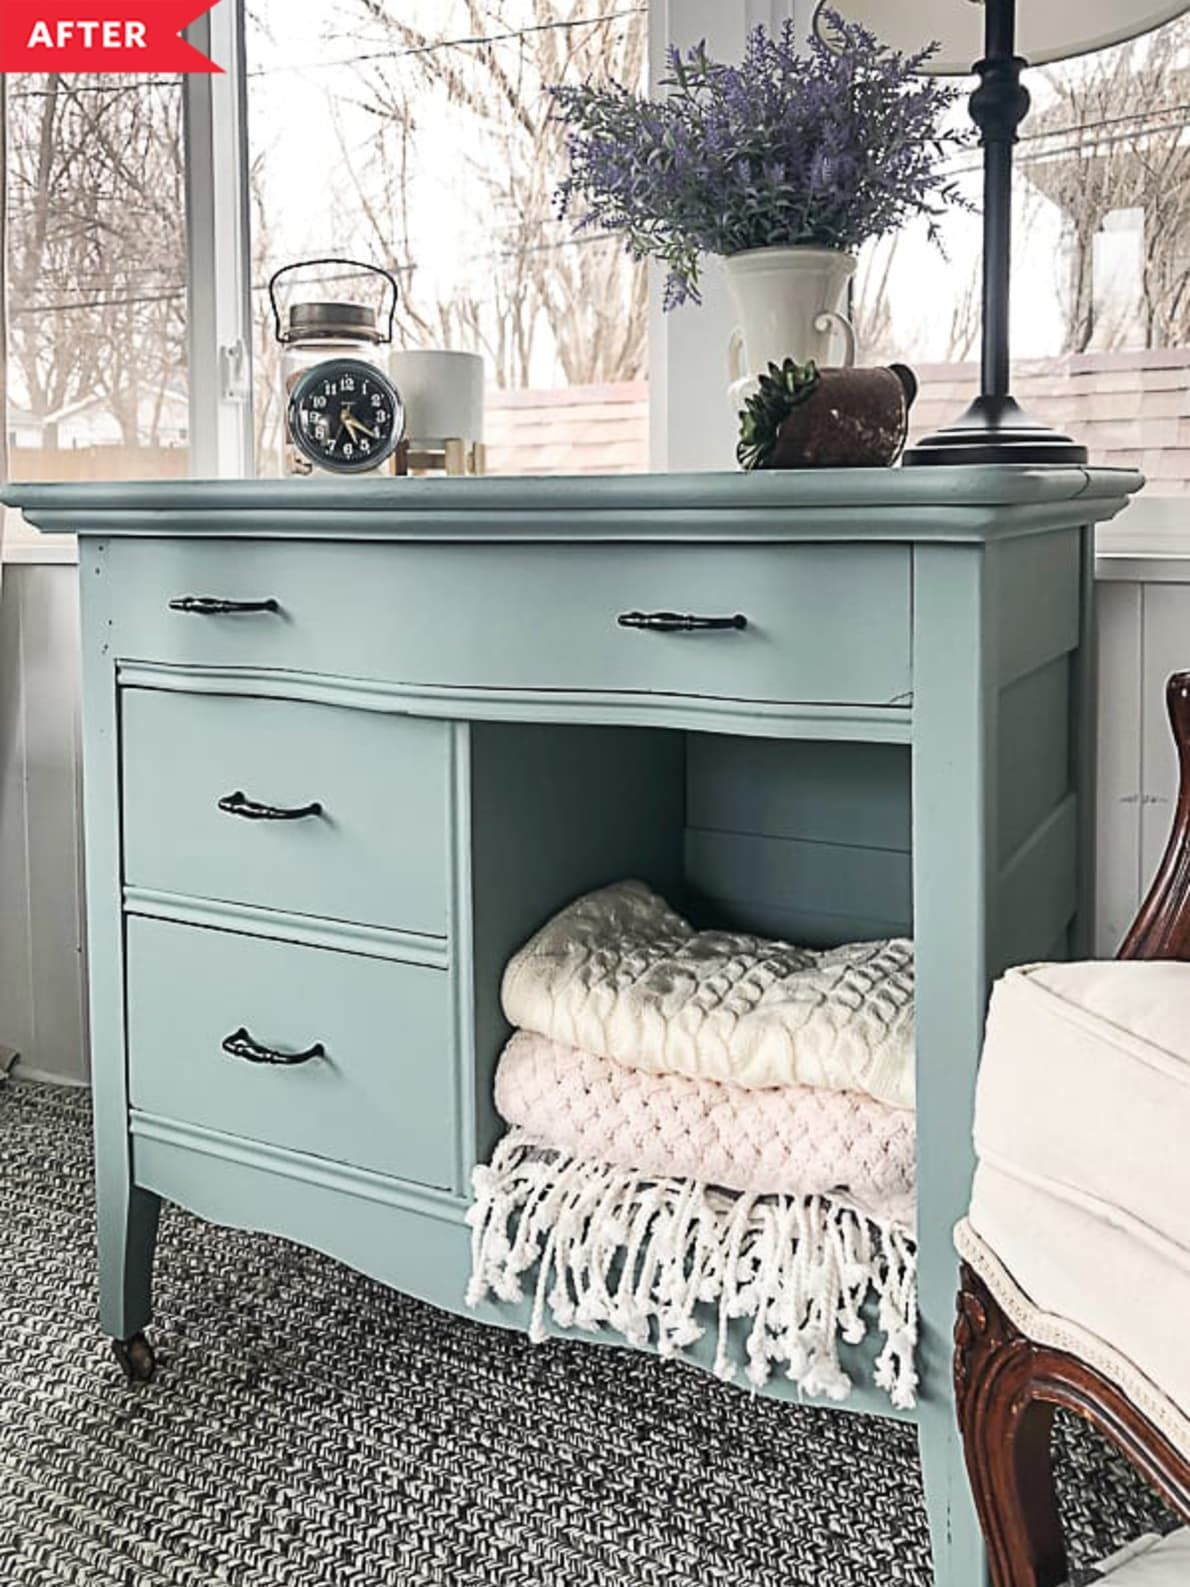 15 Inspiring Dresser Redo Ideas That Go Beyond Just Paint In 2020